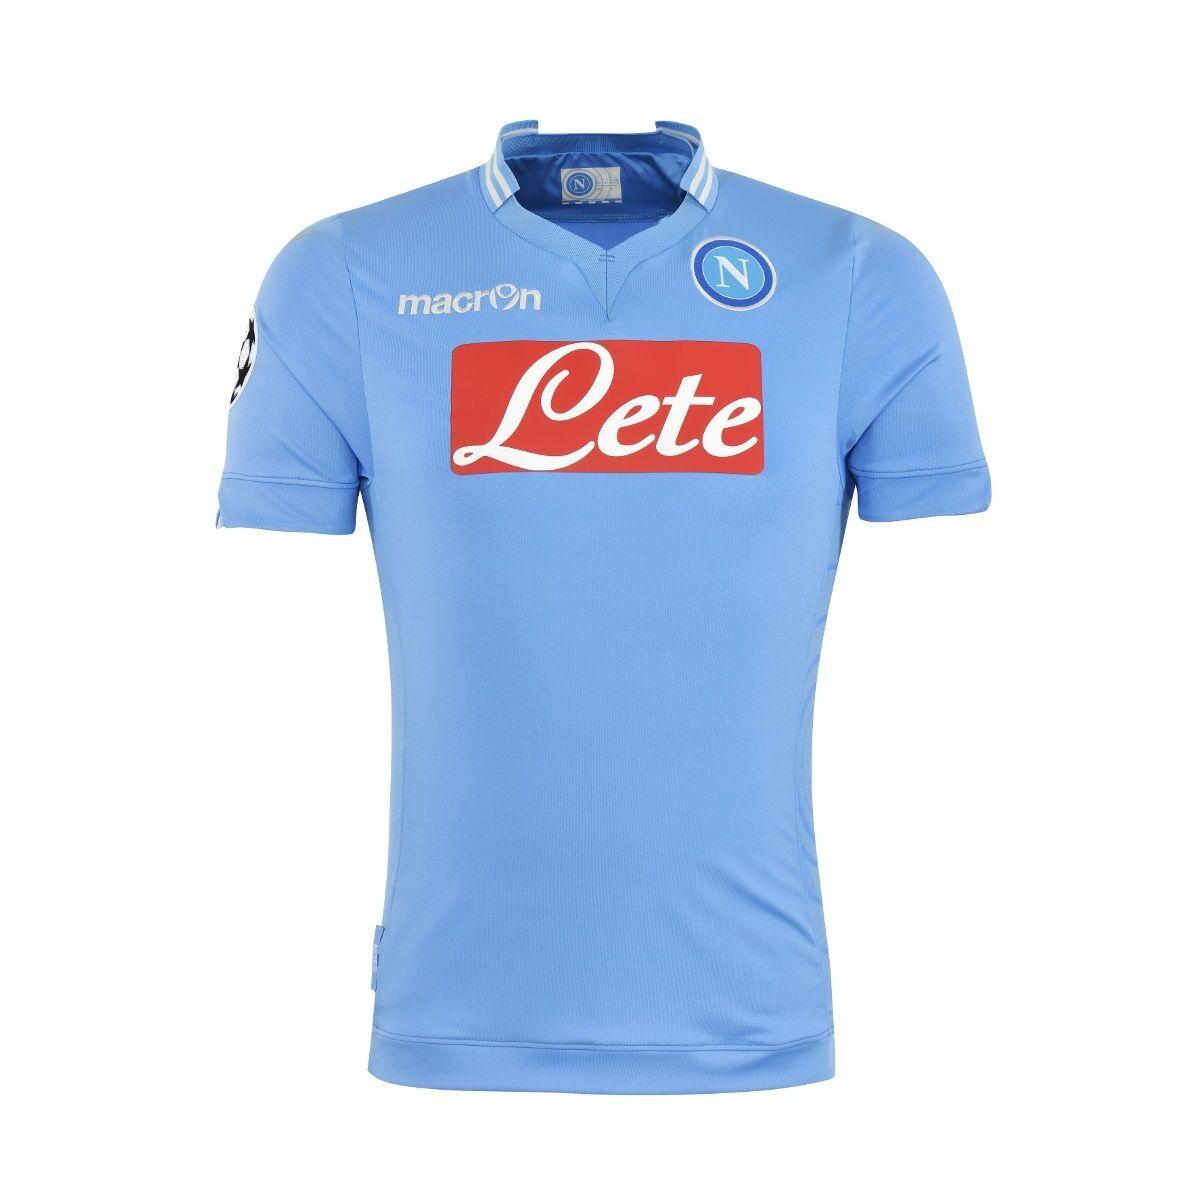 Fw13 SC Nápoles S S. mclaron camiseta campeón kamisetta